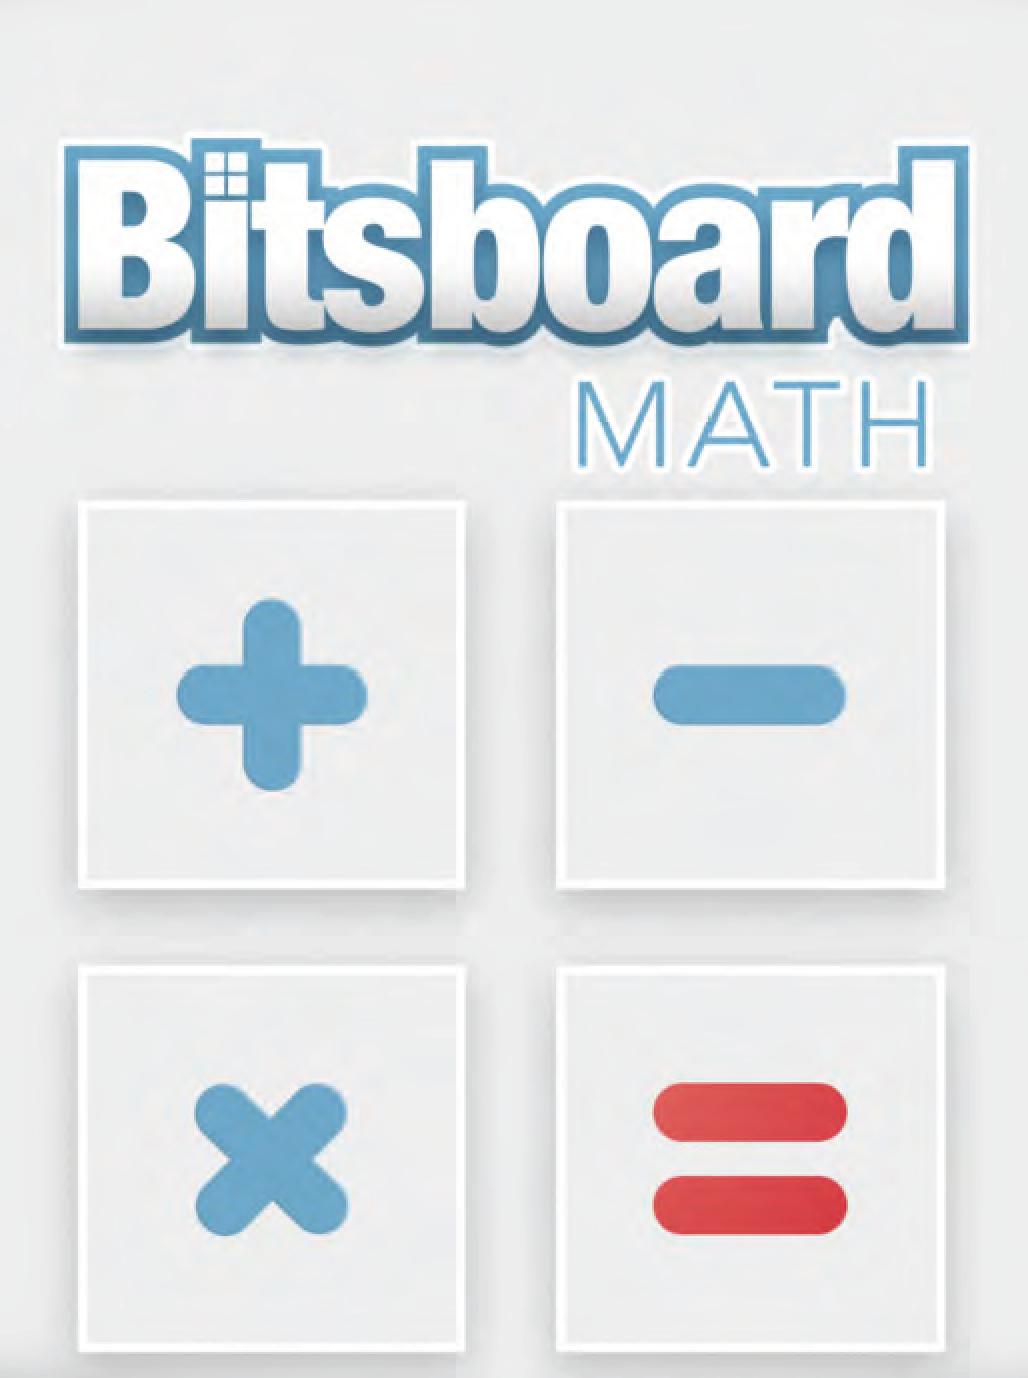 Bitsboard Math画像